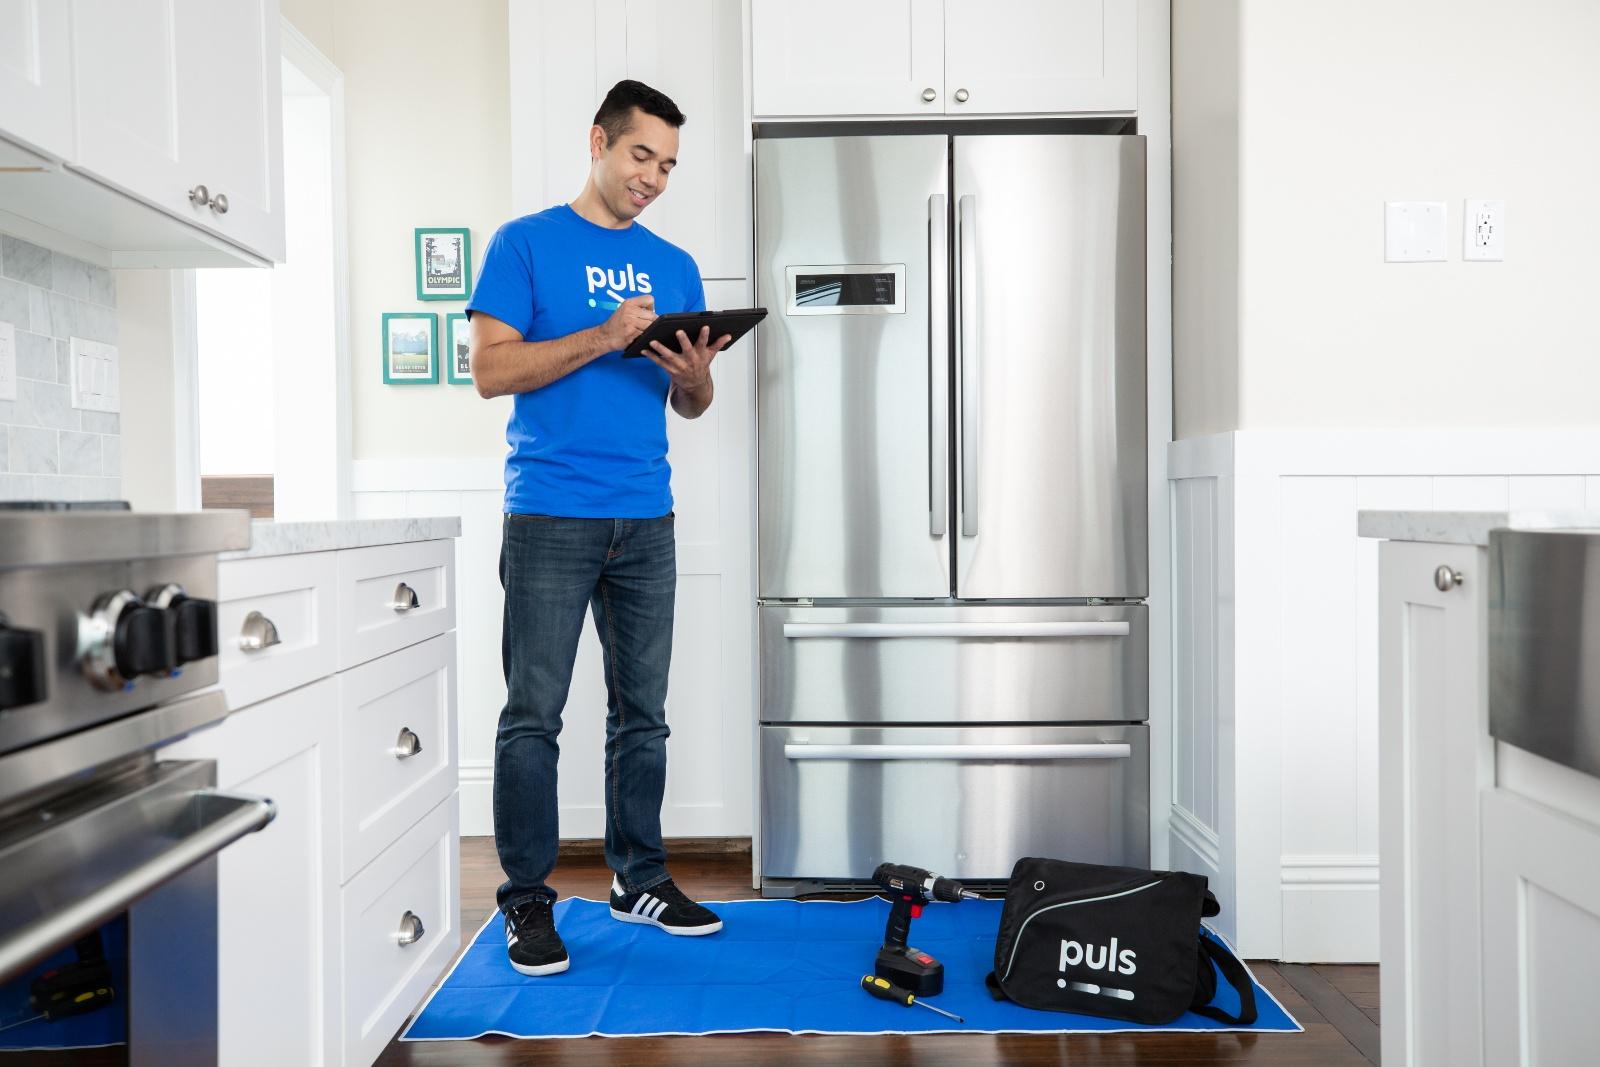 Puls refrigerator repair